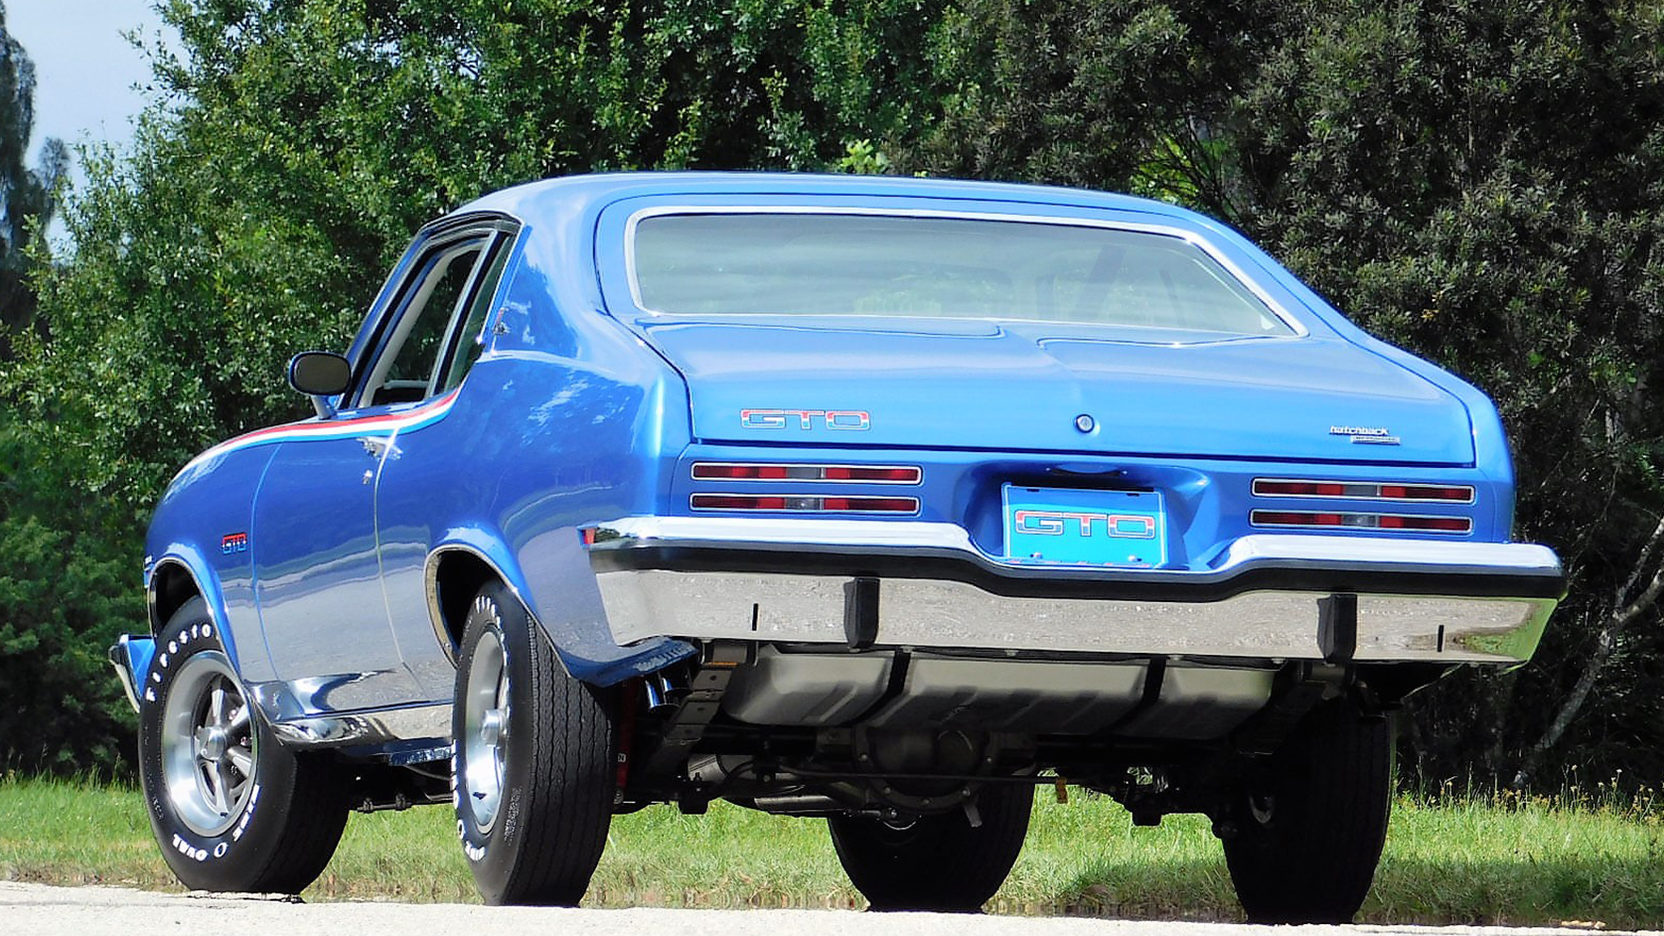 1974 Pontiac GTO rear 3/4